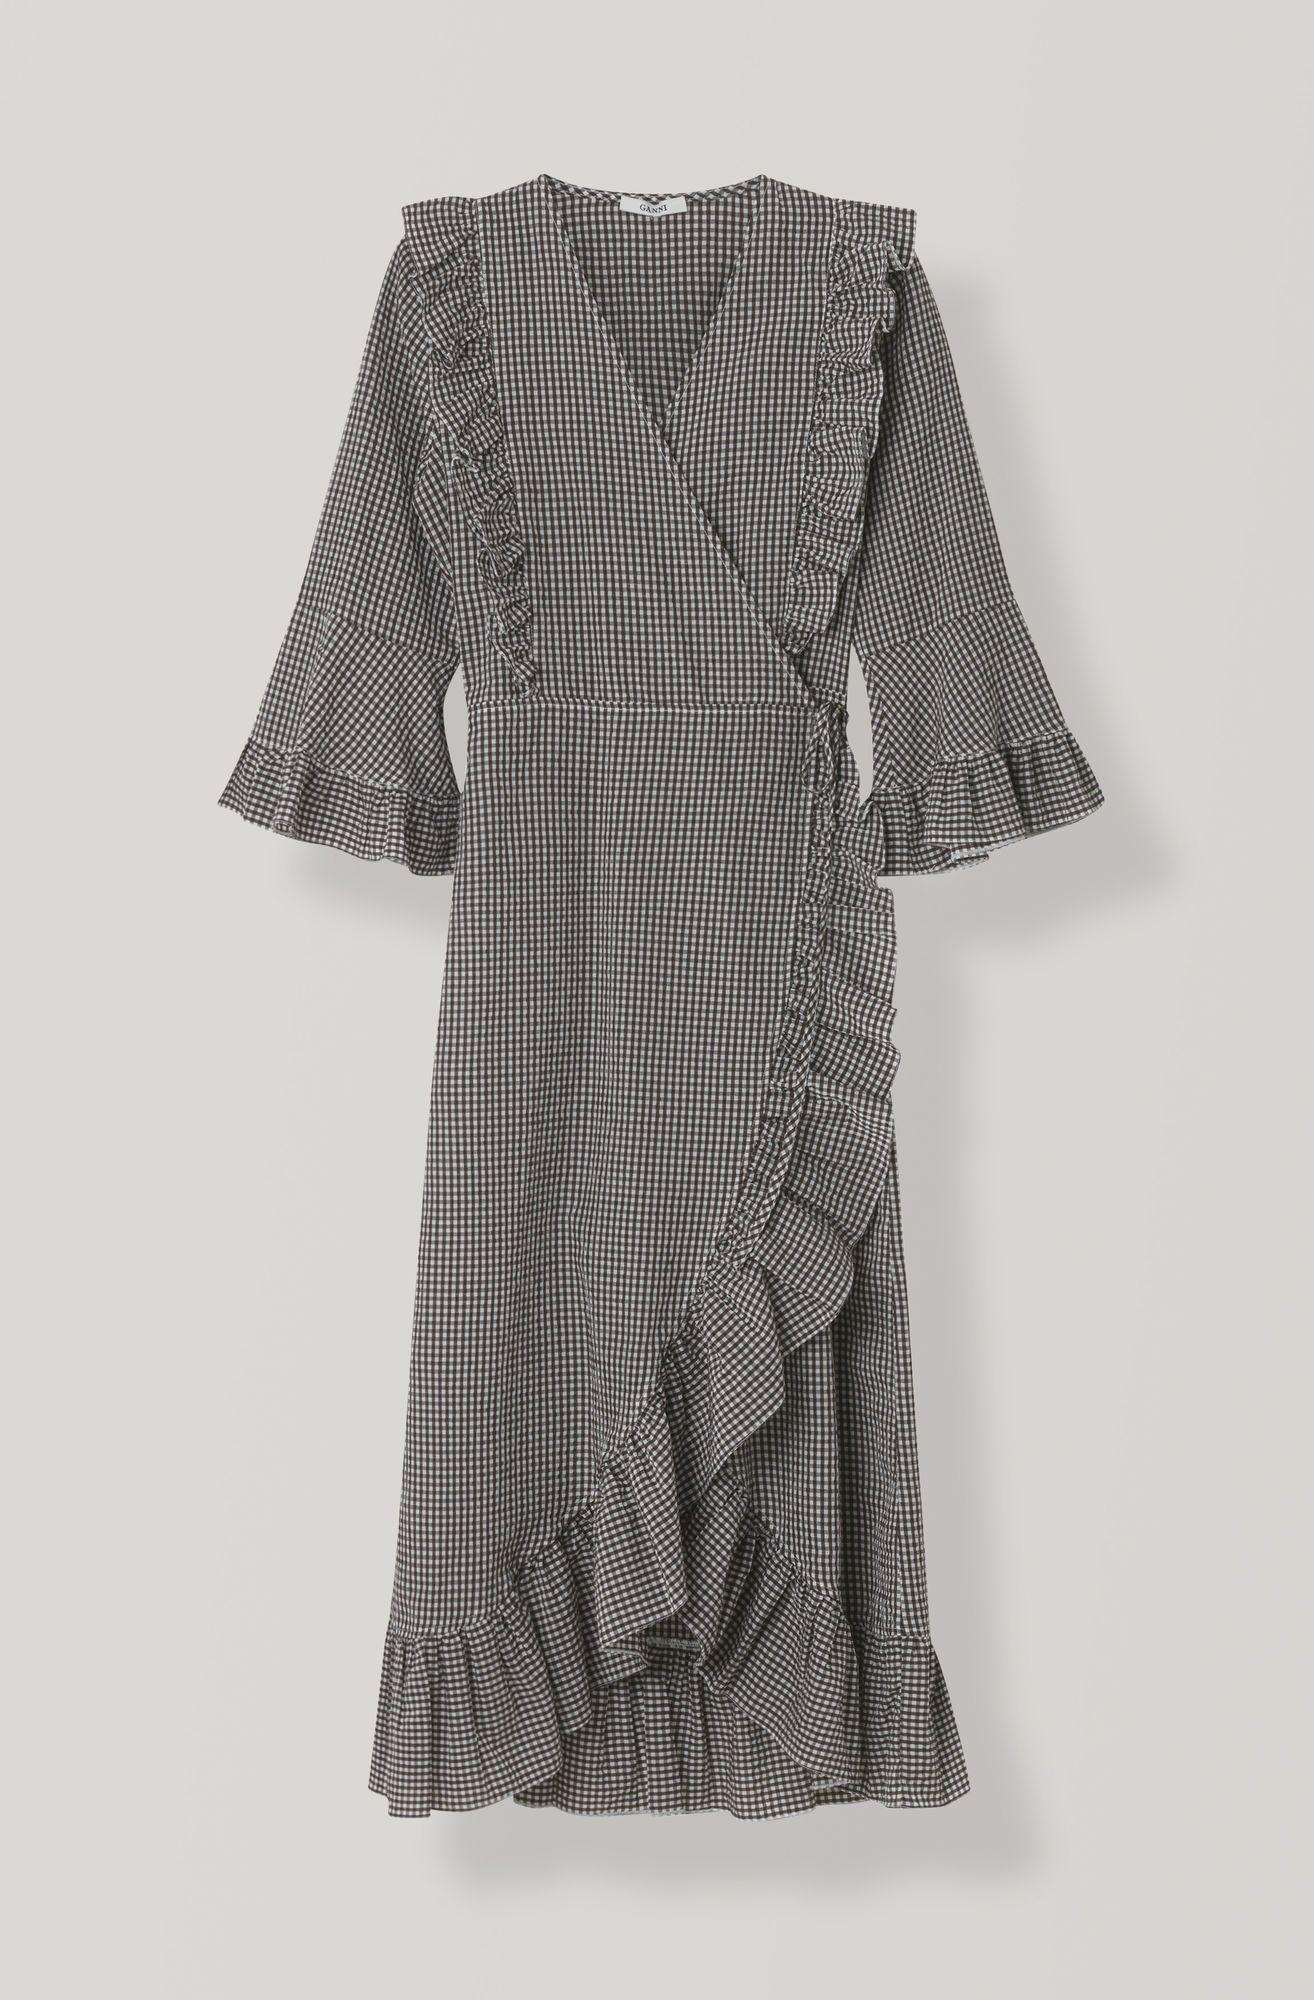 Seersucker Check Wrap Dress Ganache With Images Wrap Dress